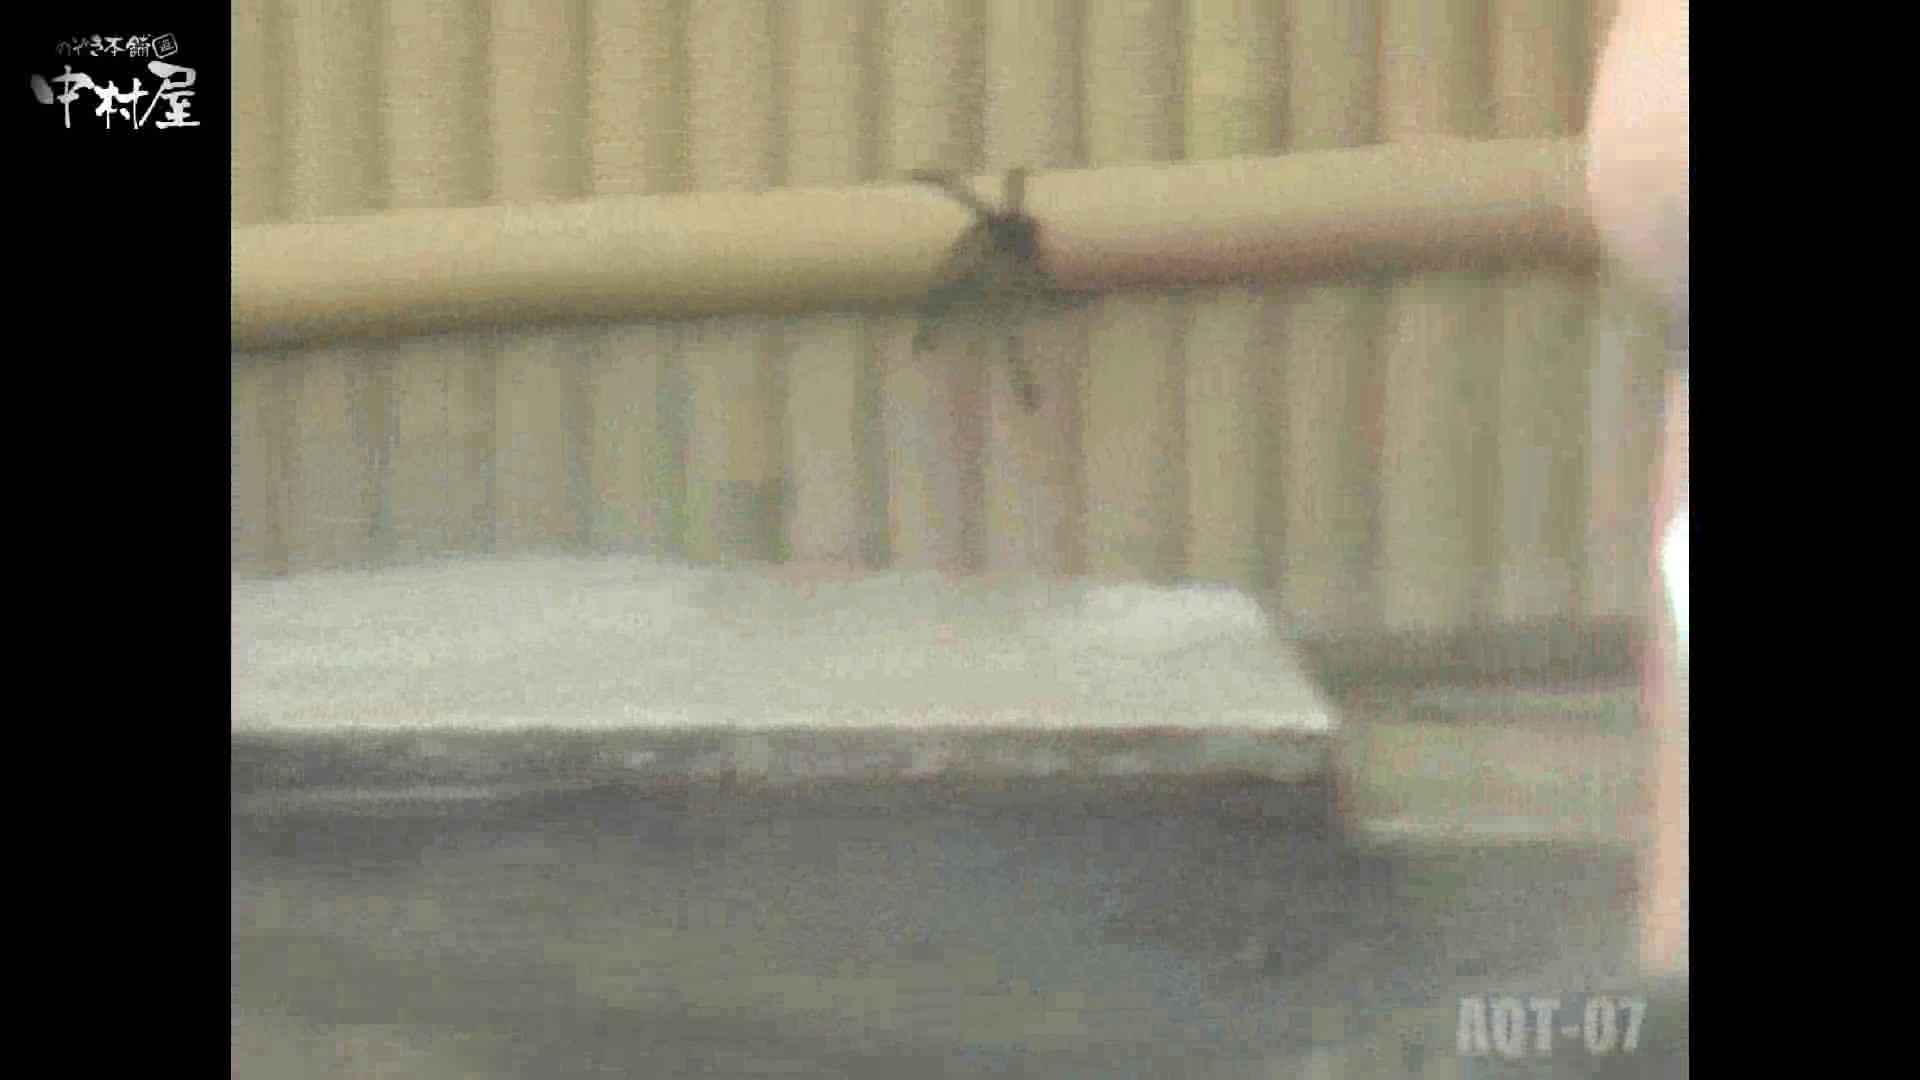 Aquaな露天風呂Vol.871潜入盗撮露天風呂七判湯 其の六 潜入  58連発 12